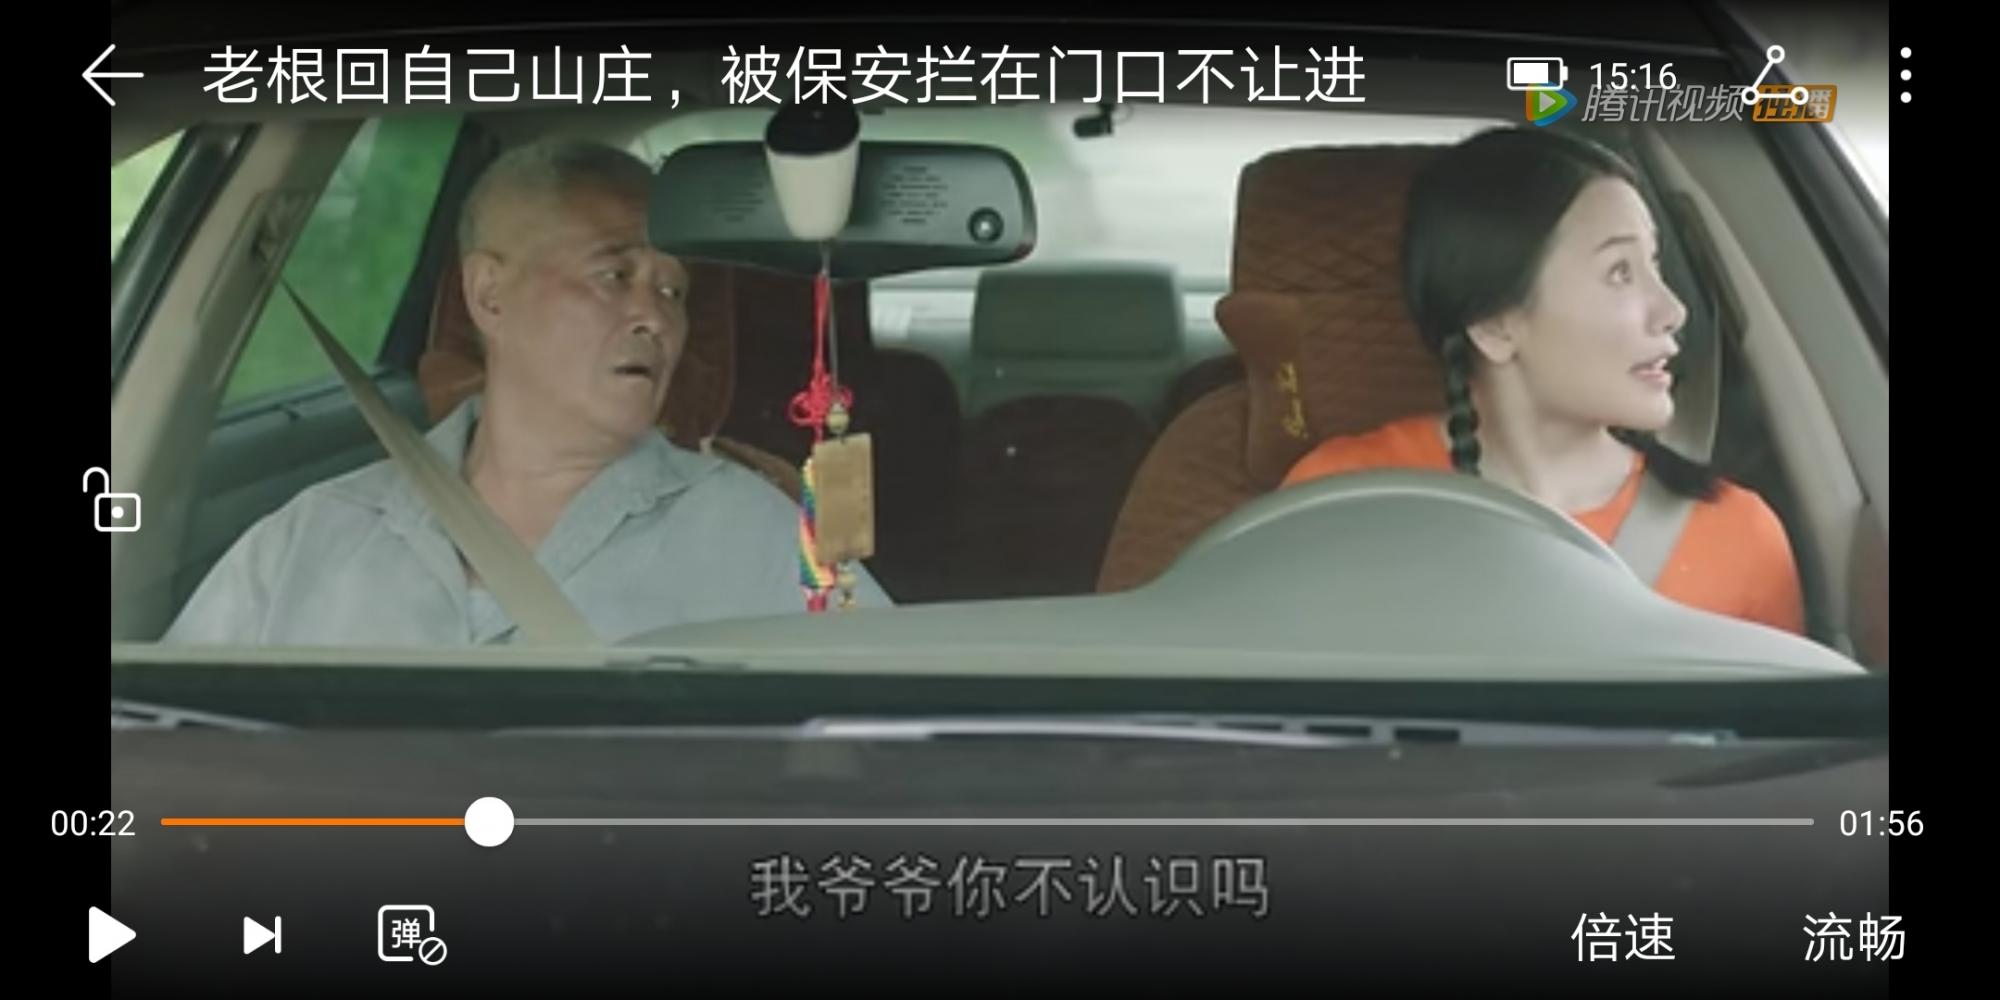 Screenshot_20200114_151622_com.tencent.qqlivehuawei.jpg